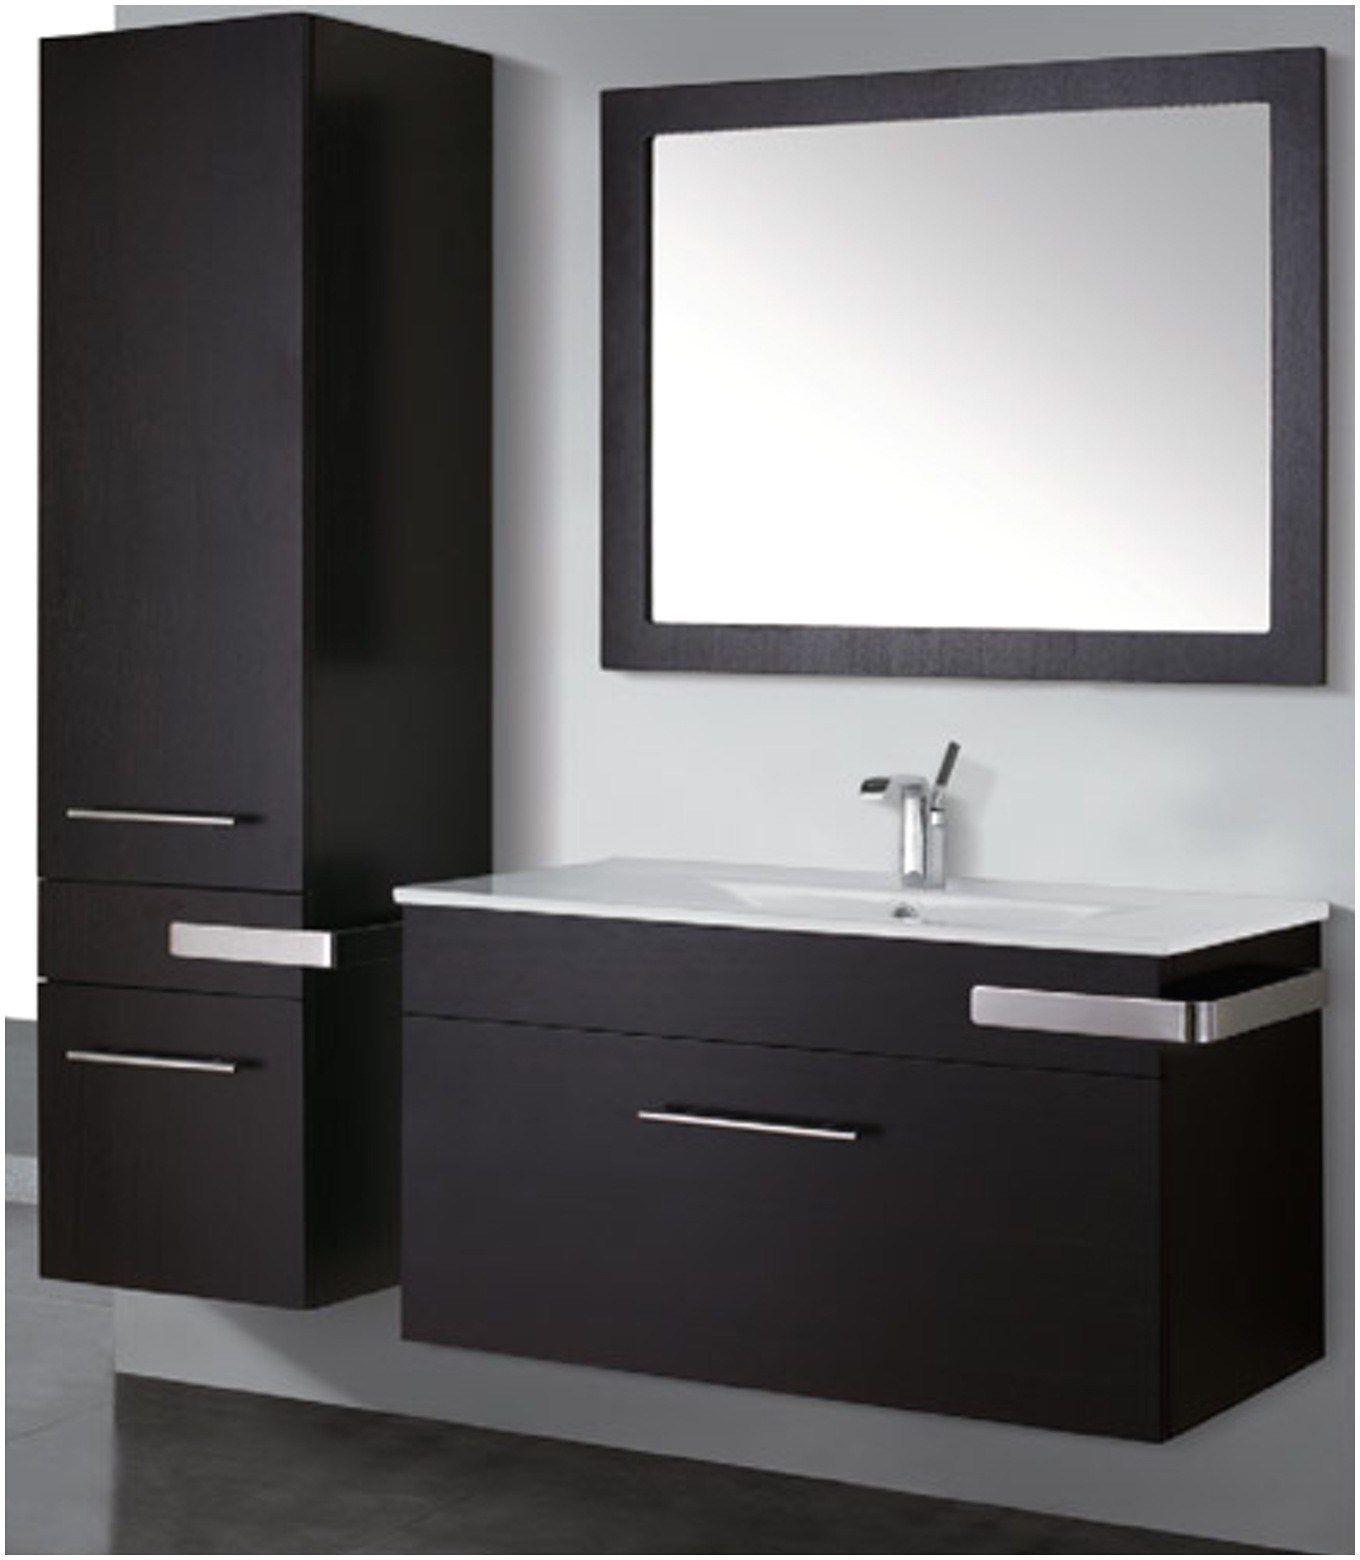 best of meuble salle de bain castorama volga  meuble